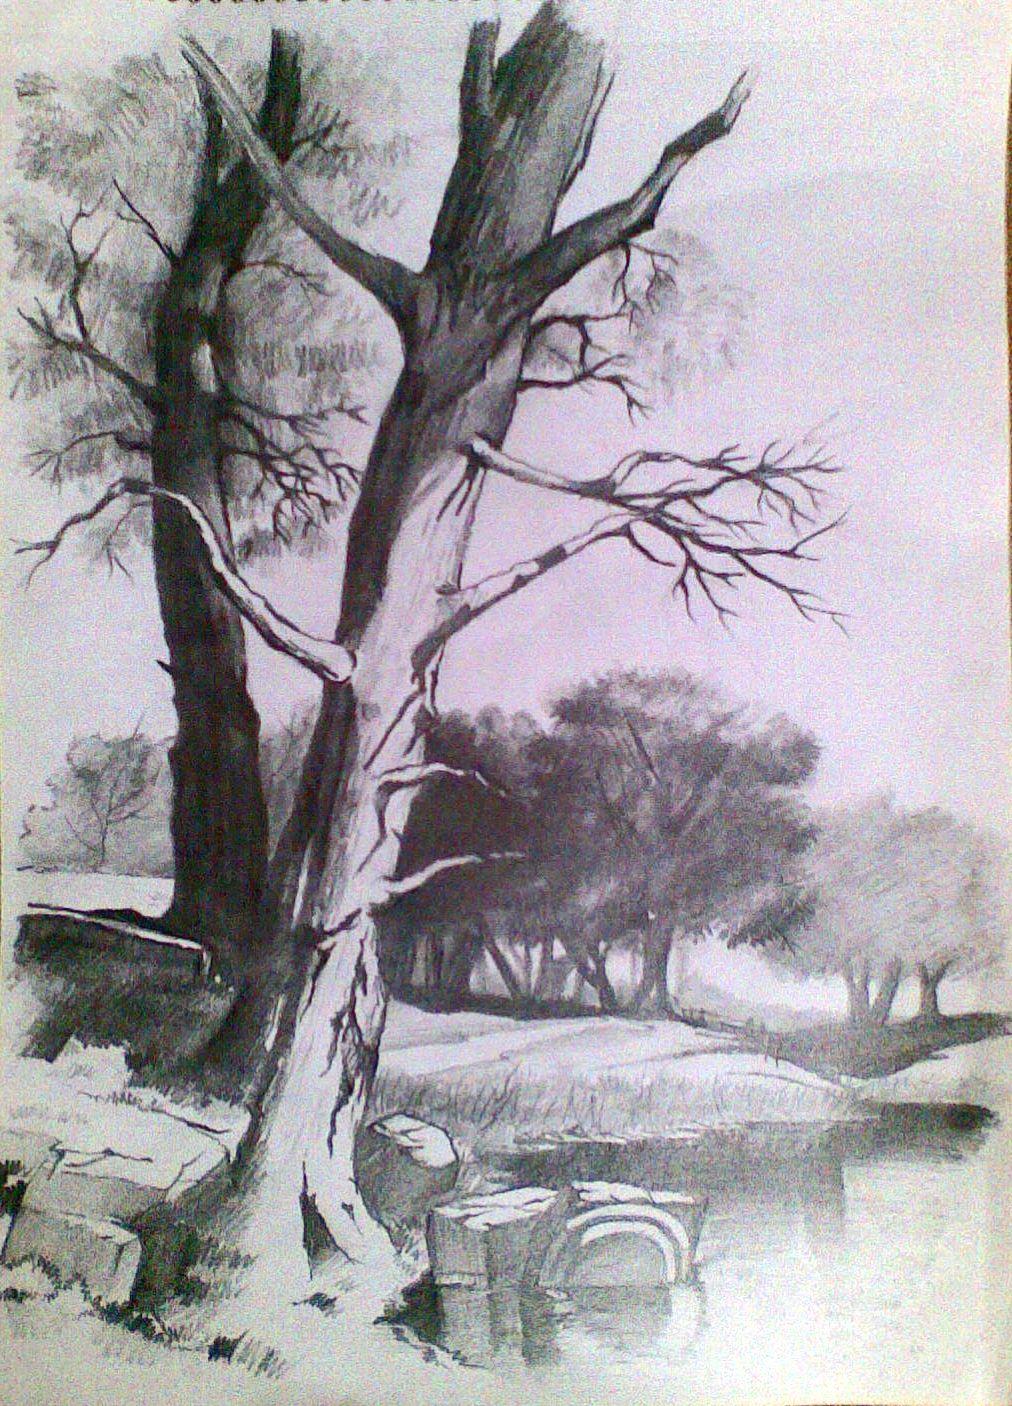 Http 3 Bp Blogspot Com Auyyviaw3aw Tfeawzswuli Aaaaaaaaae8 Gdntemkdu6o S1600 06062011 2528006 2 Landschaftsskizze Landschaftszeichnungen Landschaft Zeichnen